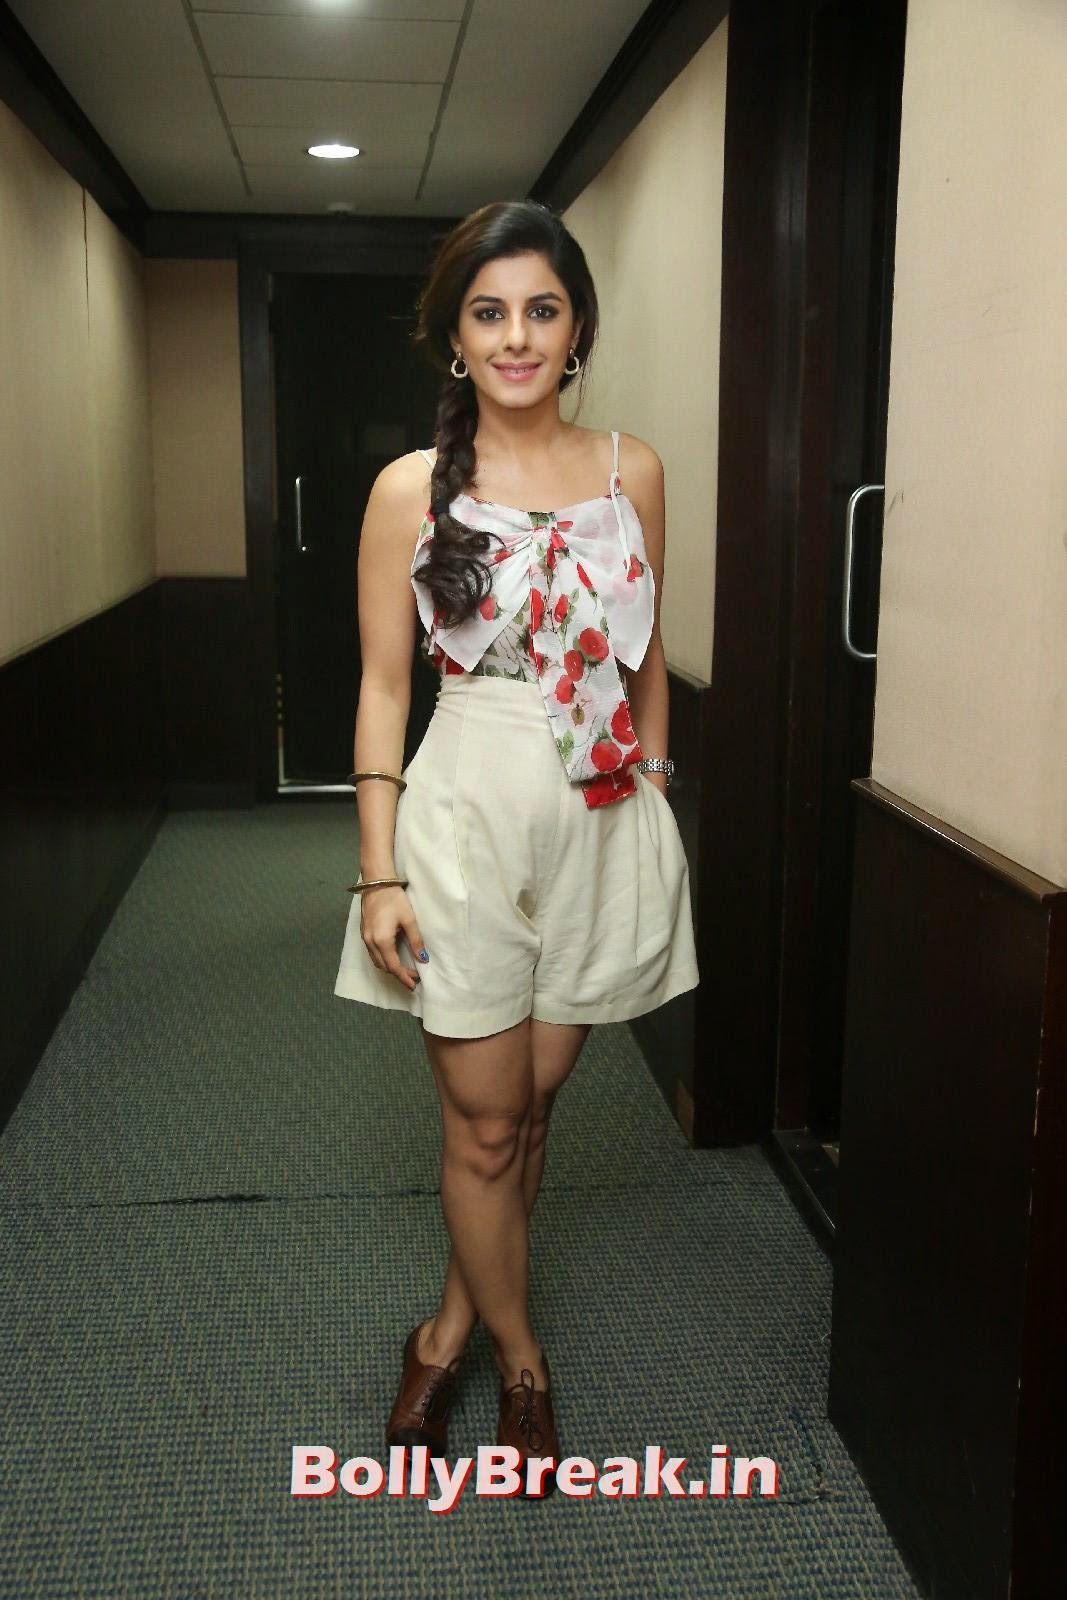 Isha Talwar (3), Isha Talwar Cute Pics - Beautiful South Actress